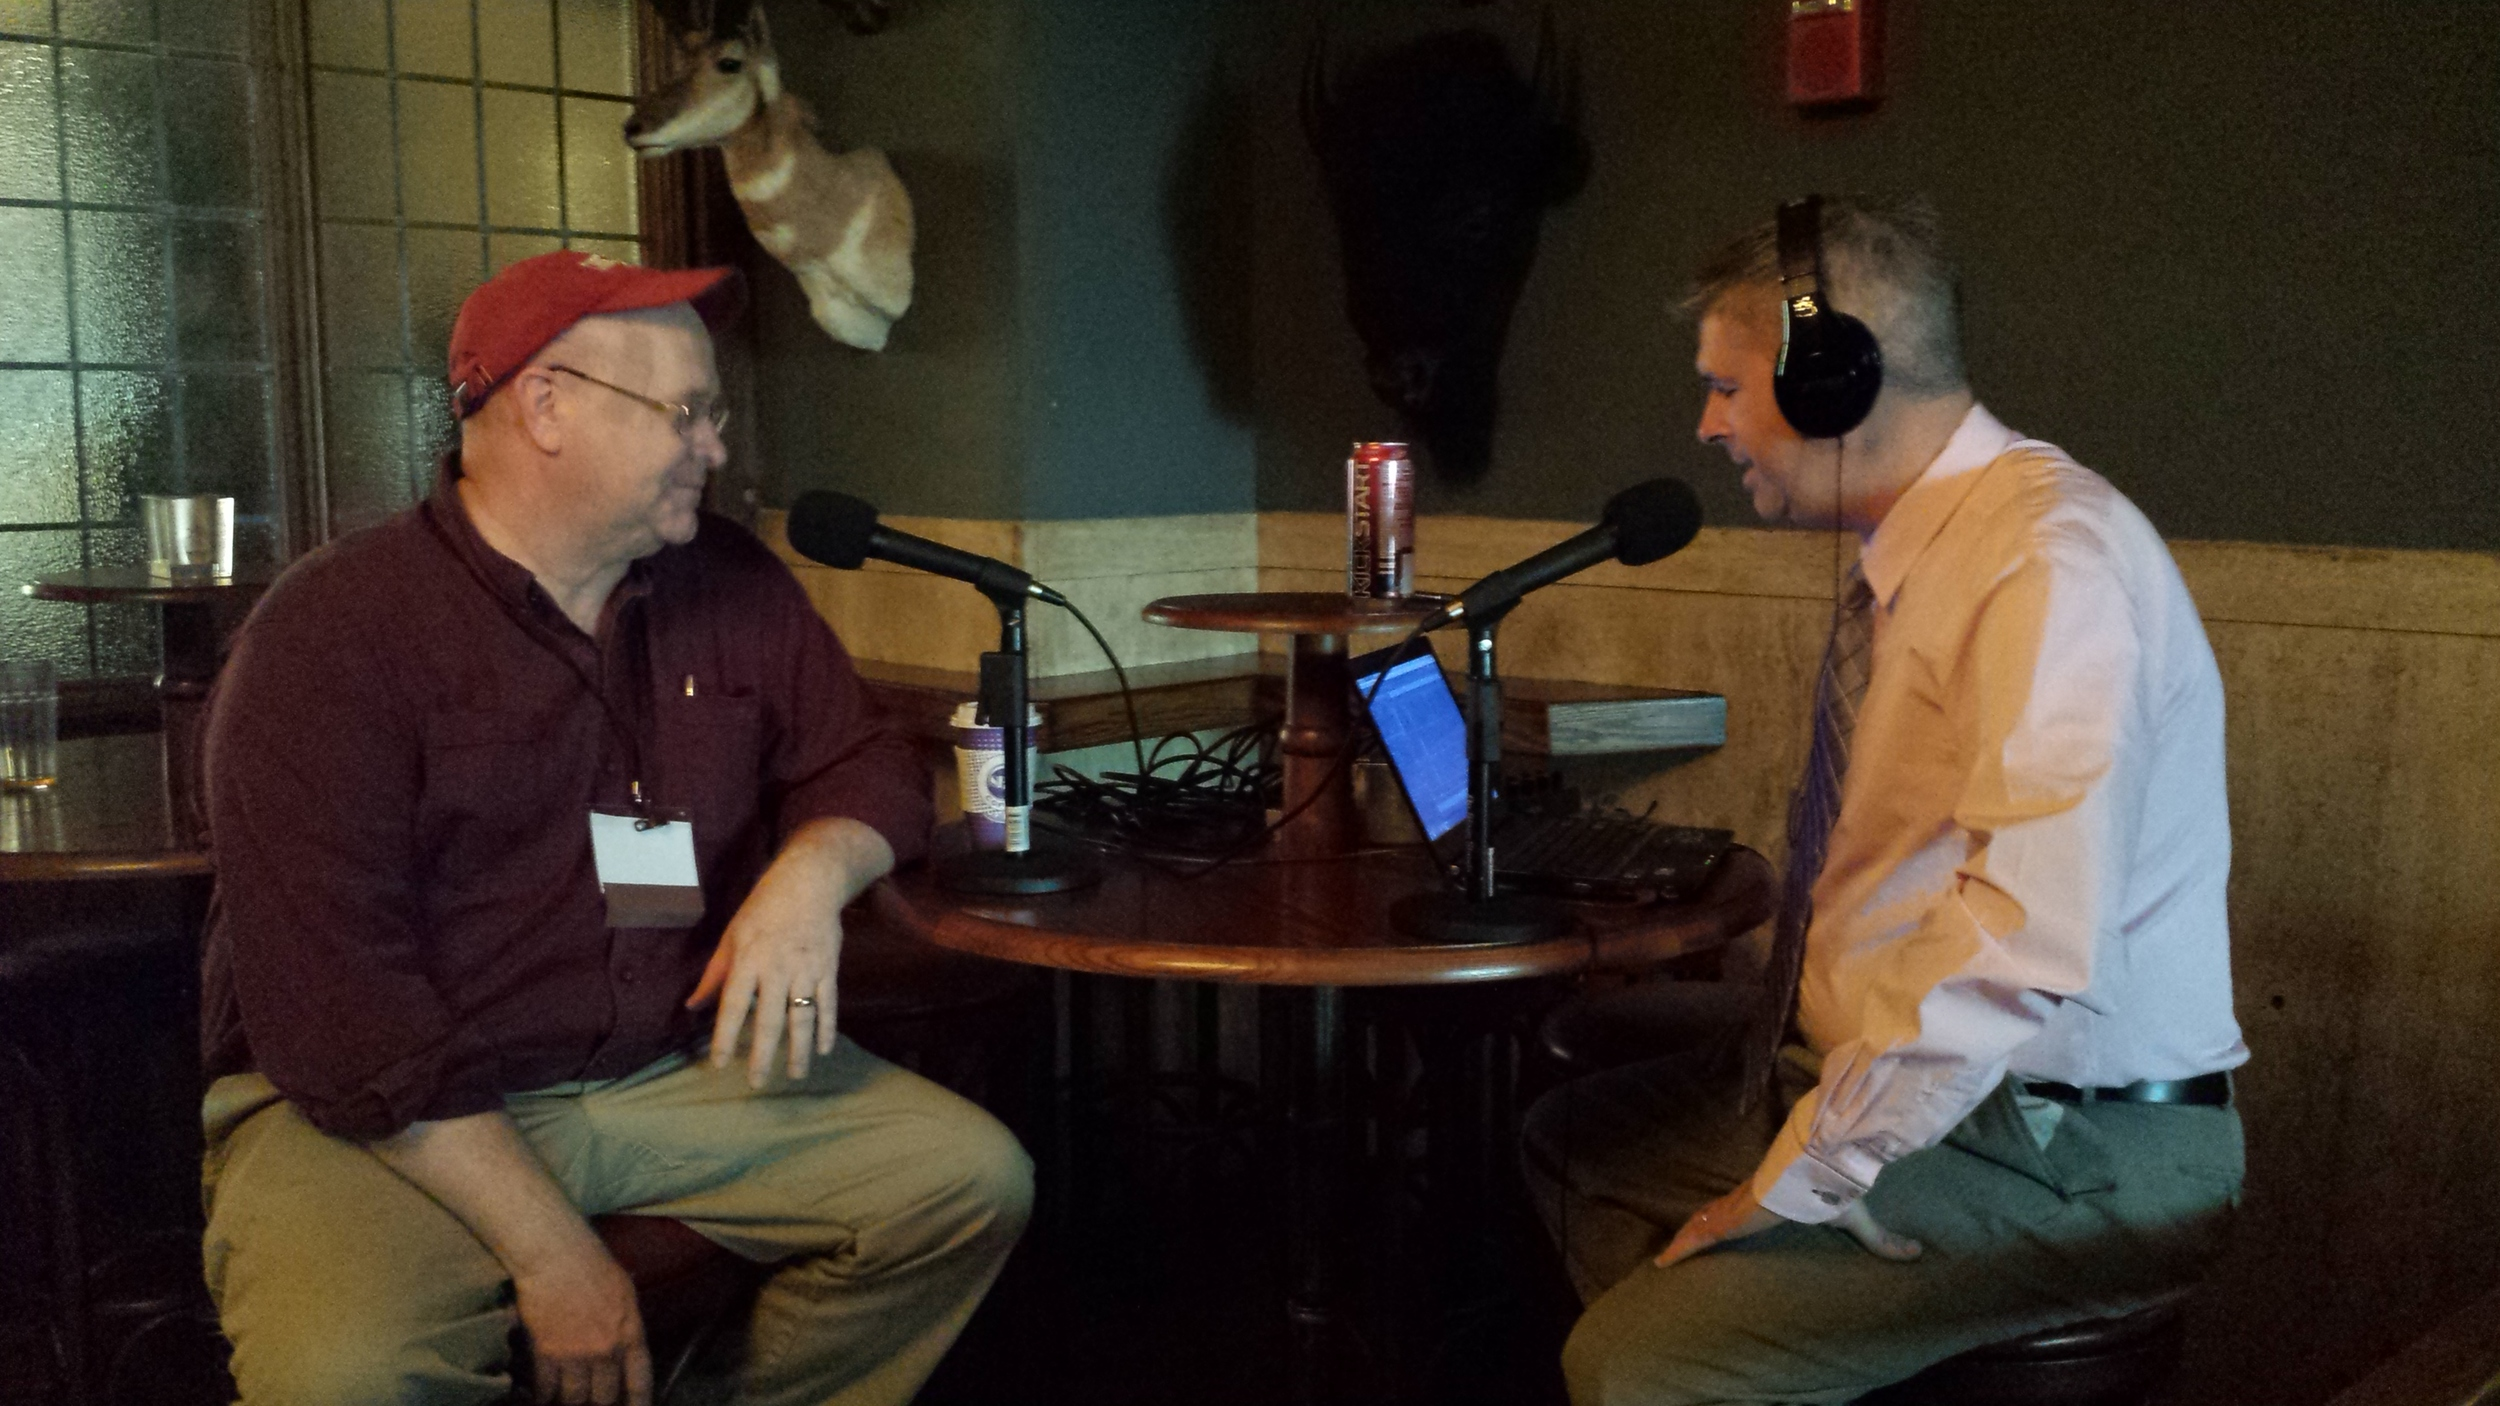 R. John Anderson and Chuck Marohn at CNU 23 in Buffalo.